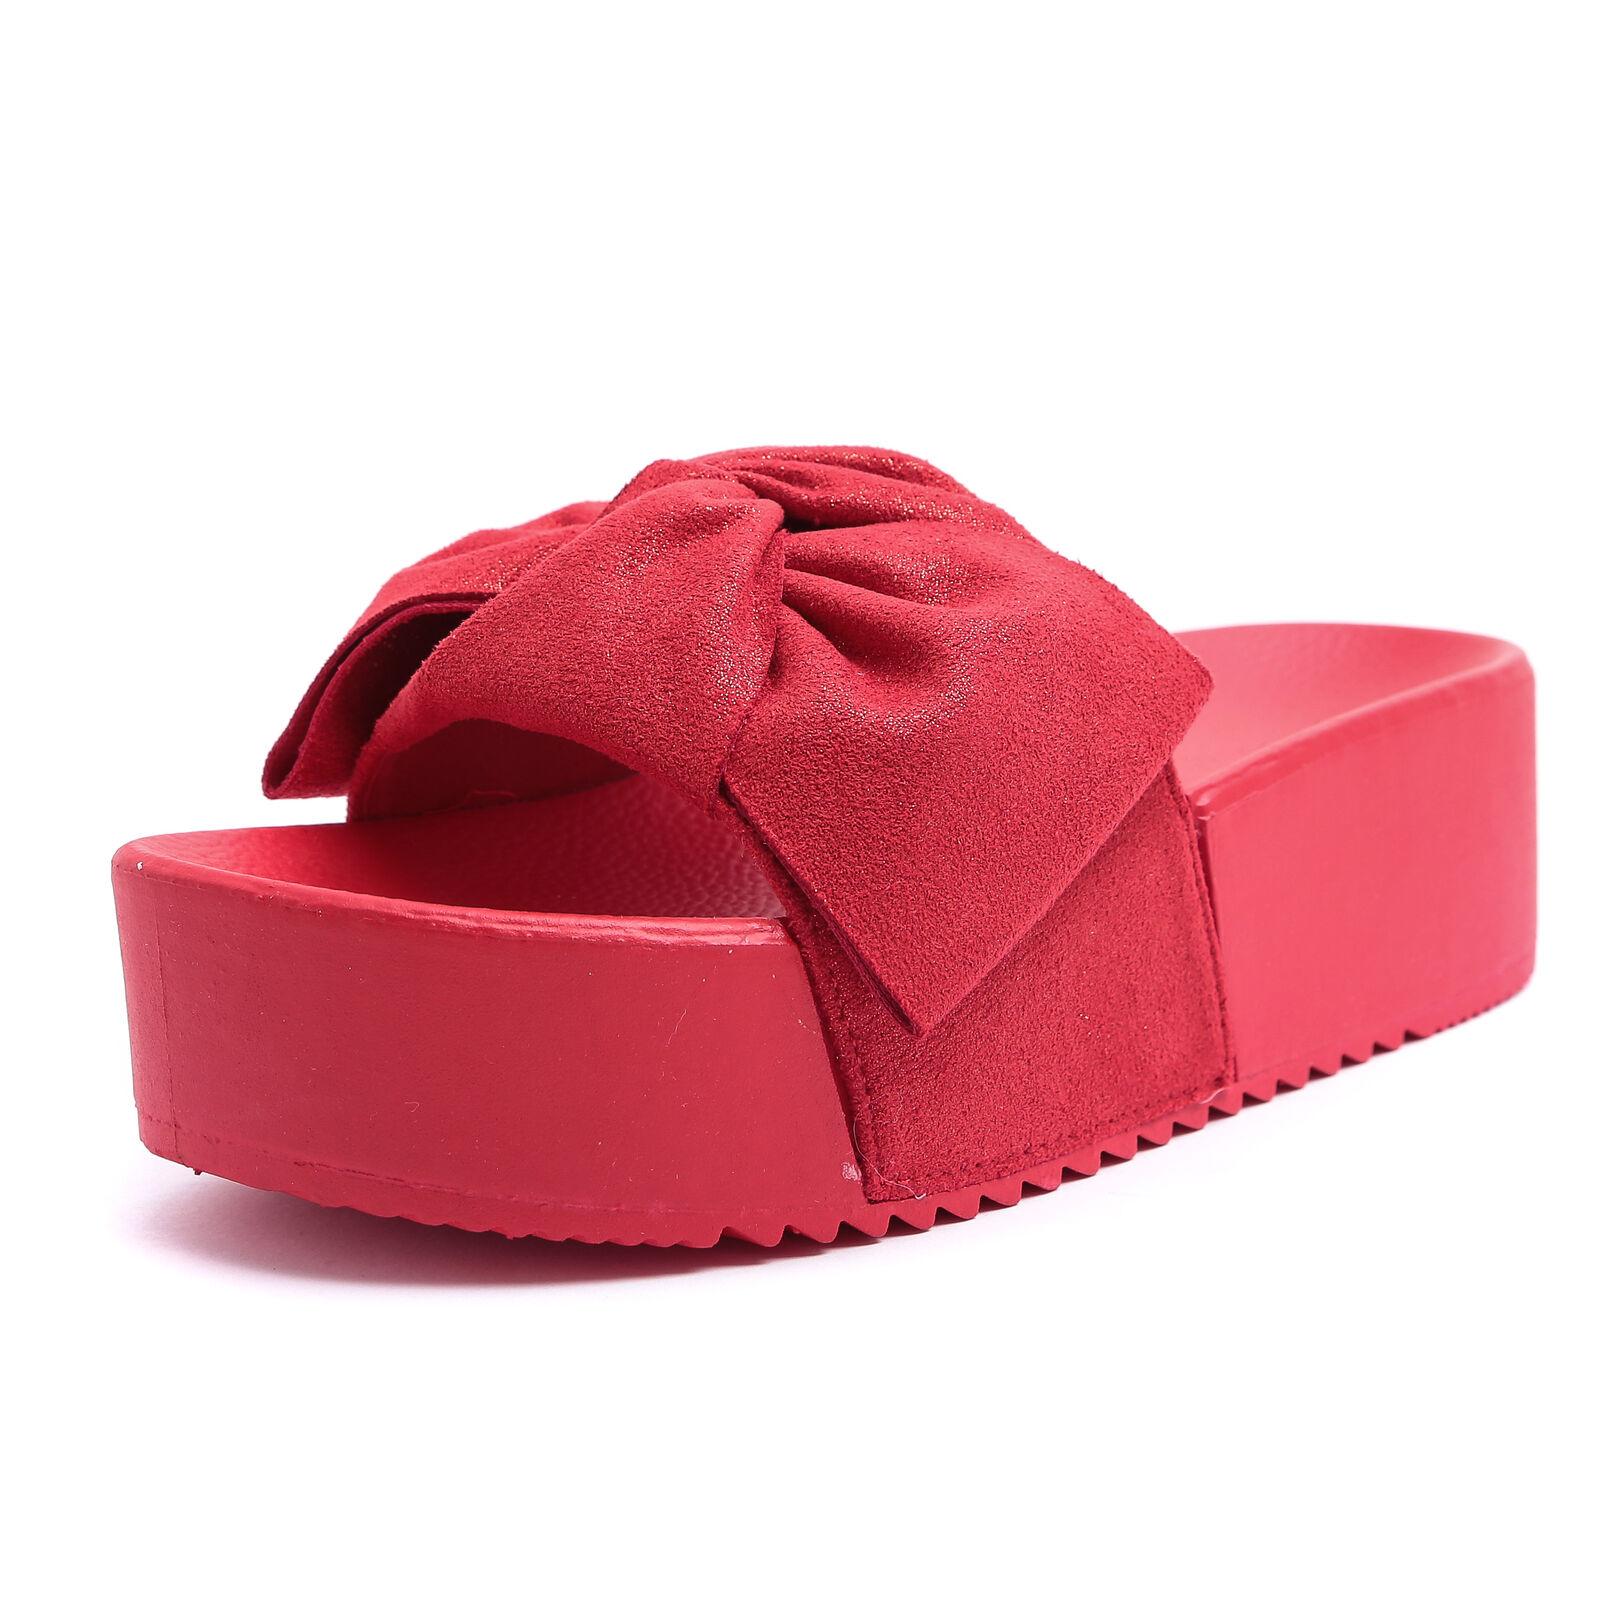 online store c85fb 8b503 Ciabatte ciabattina aperta donna sandali scarpe gomma zeppa ...